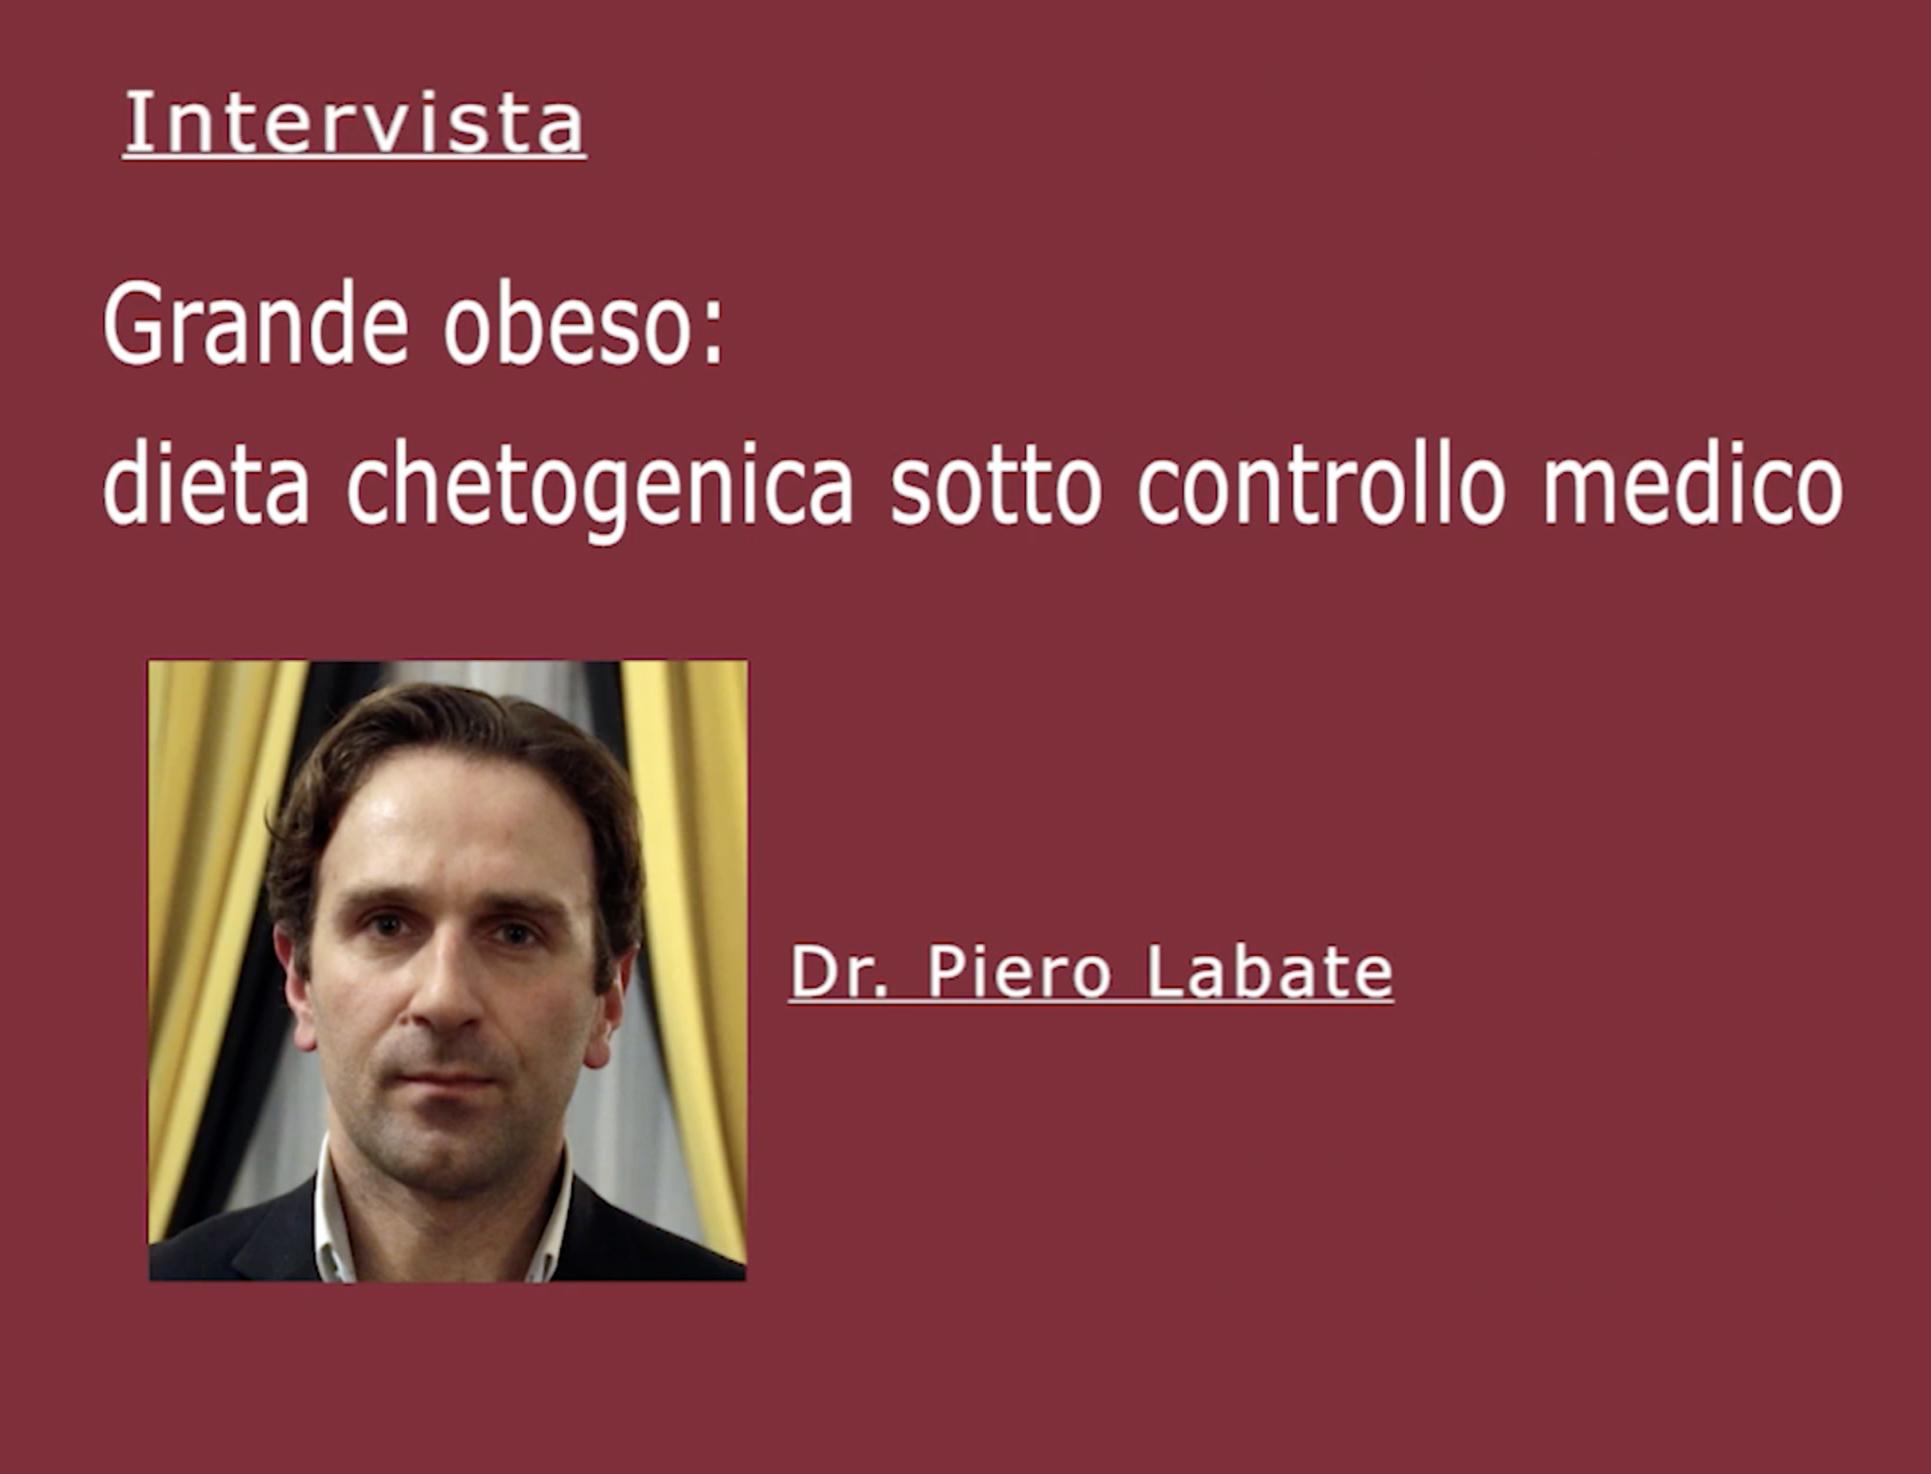 Dr. Piero Labate1